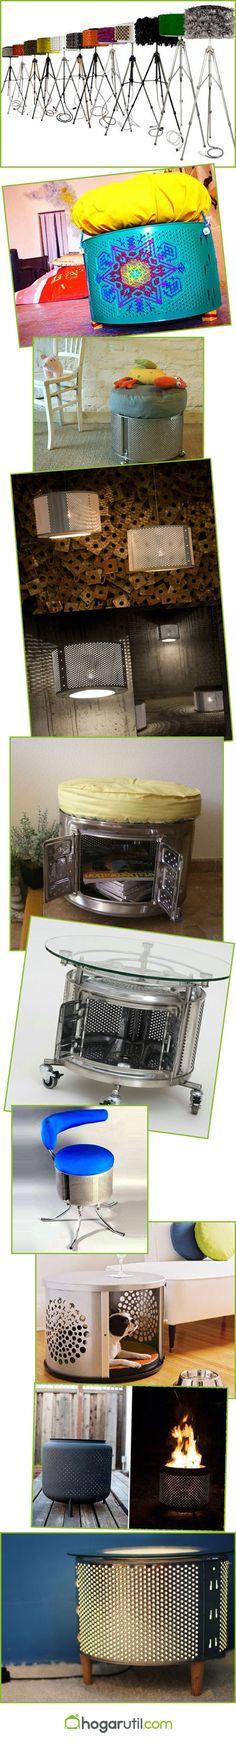 Reciclar tambor de lavadora 10 ideas para reciclar tambores de lavadora tambor de, 10 idea, de lavadora, para reciclar